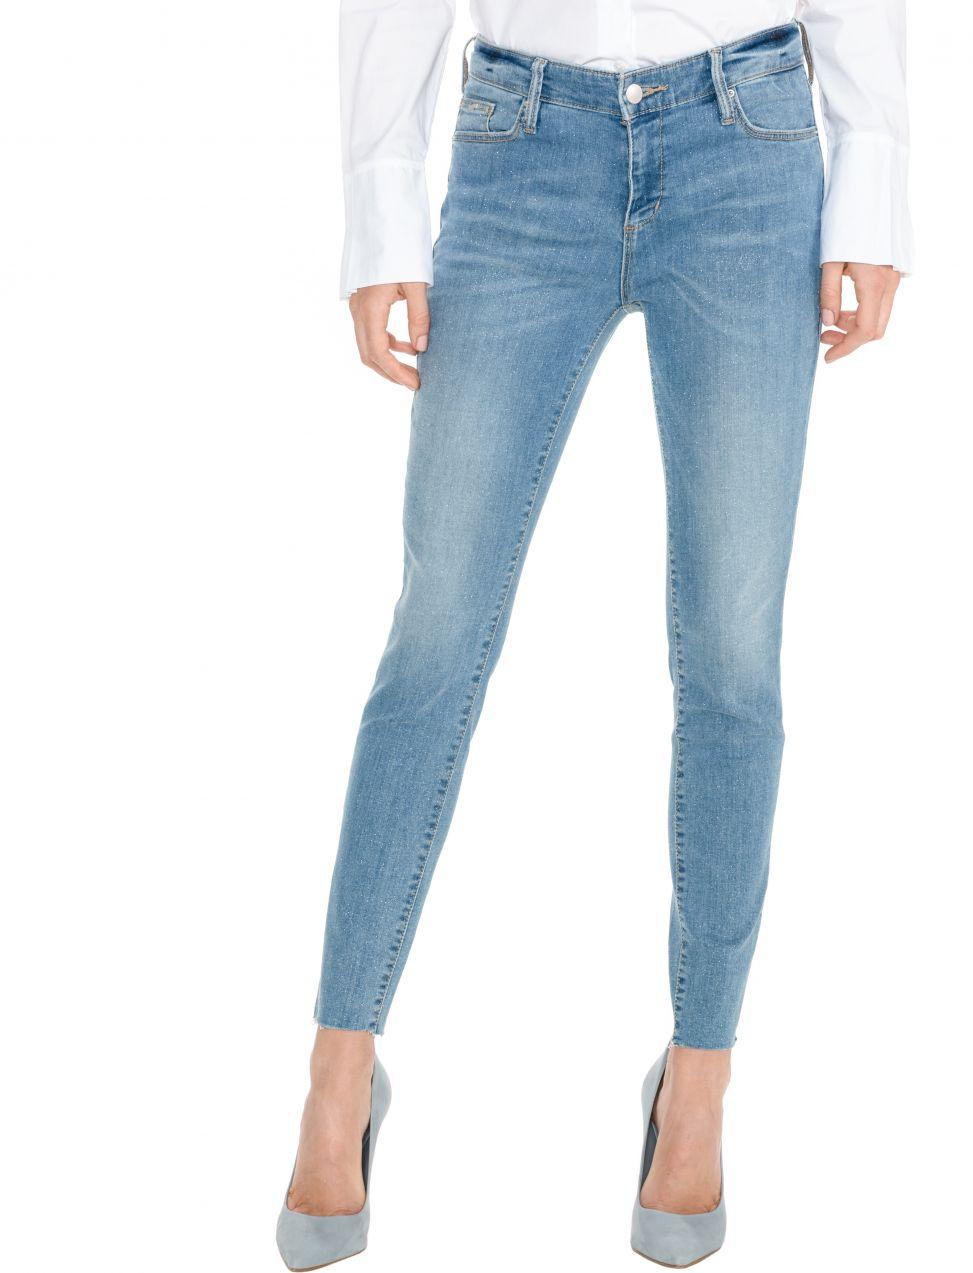 c8d4d05bc87f Star Jeans GAS